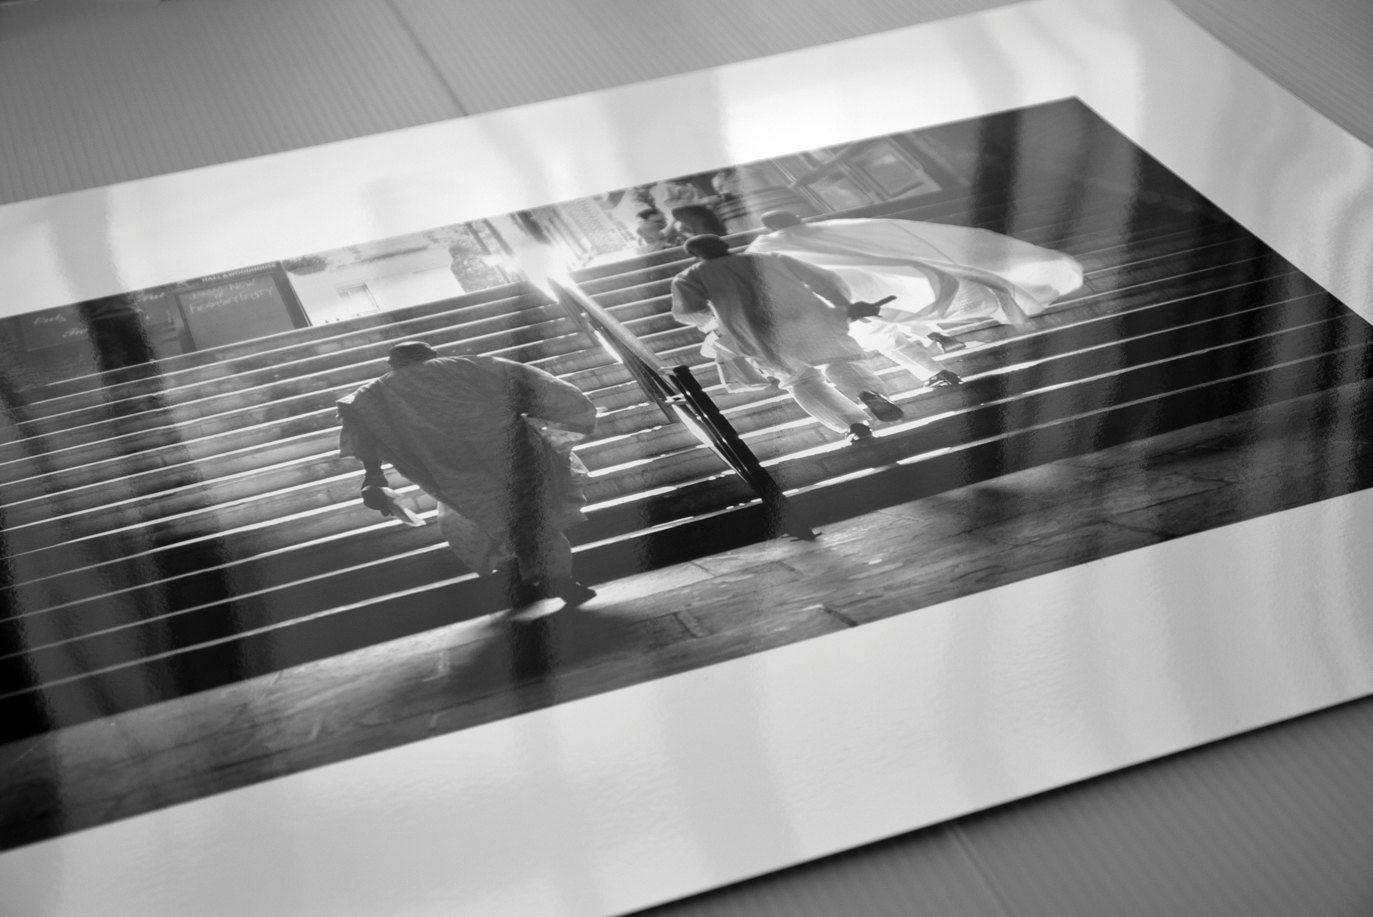 Sold today on etsy 40 x 30cm kodak metallic print etsy shop sold today on etsy 40 x 30cm kodak metallic print kristyandbryce Gallery